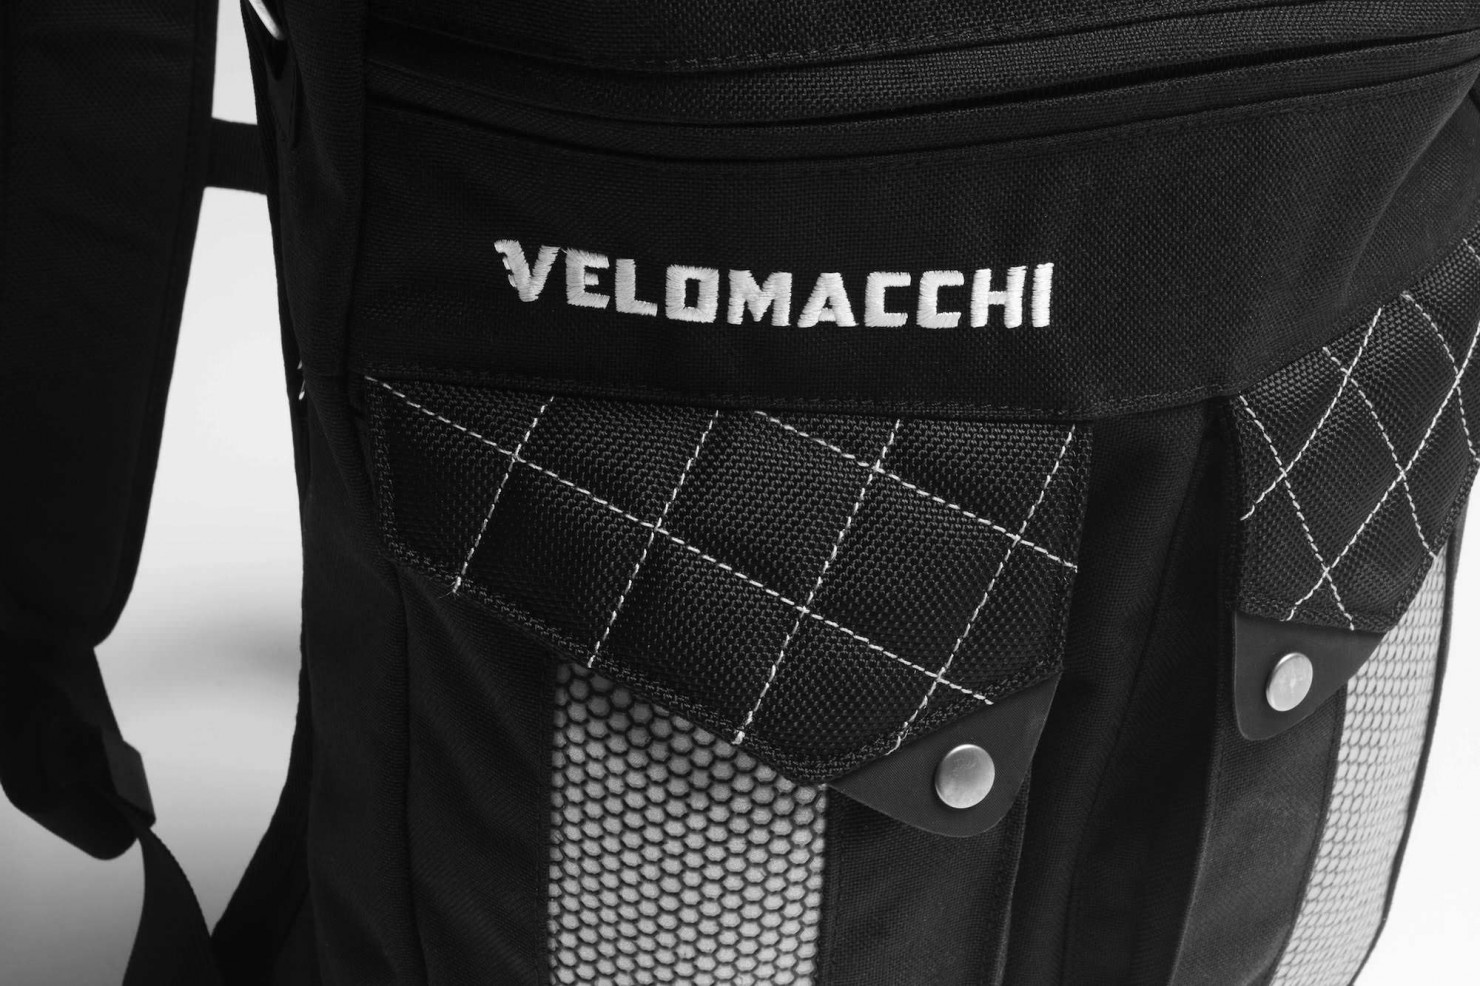 Velomacchi